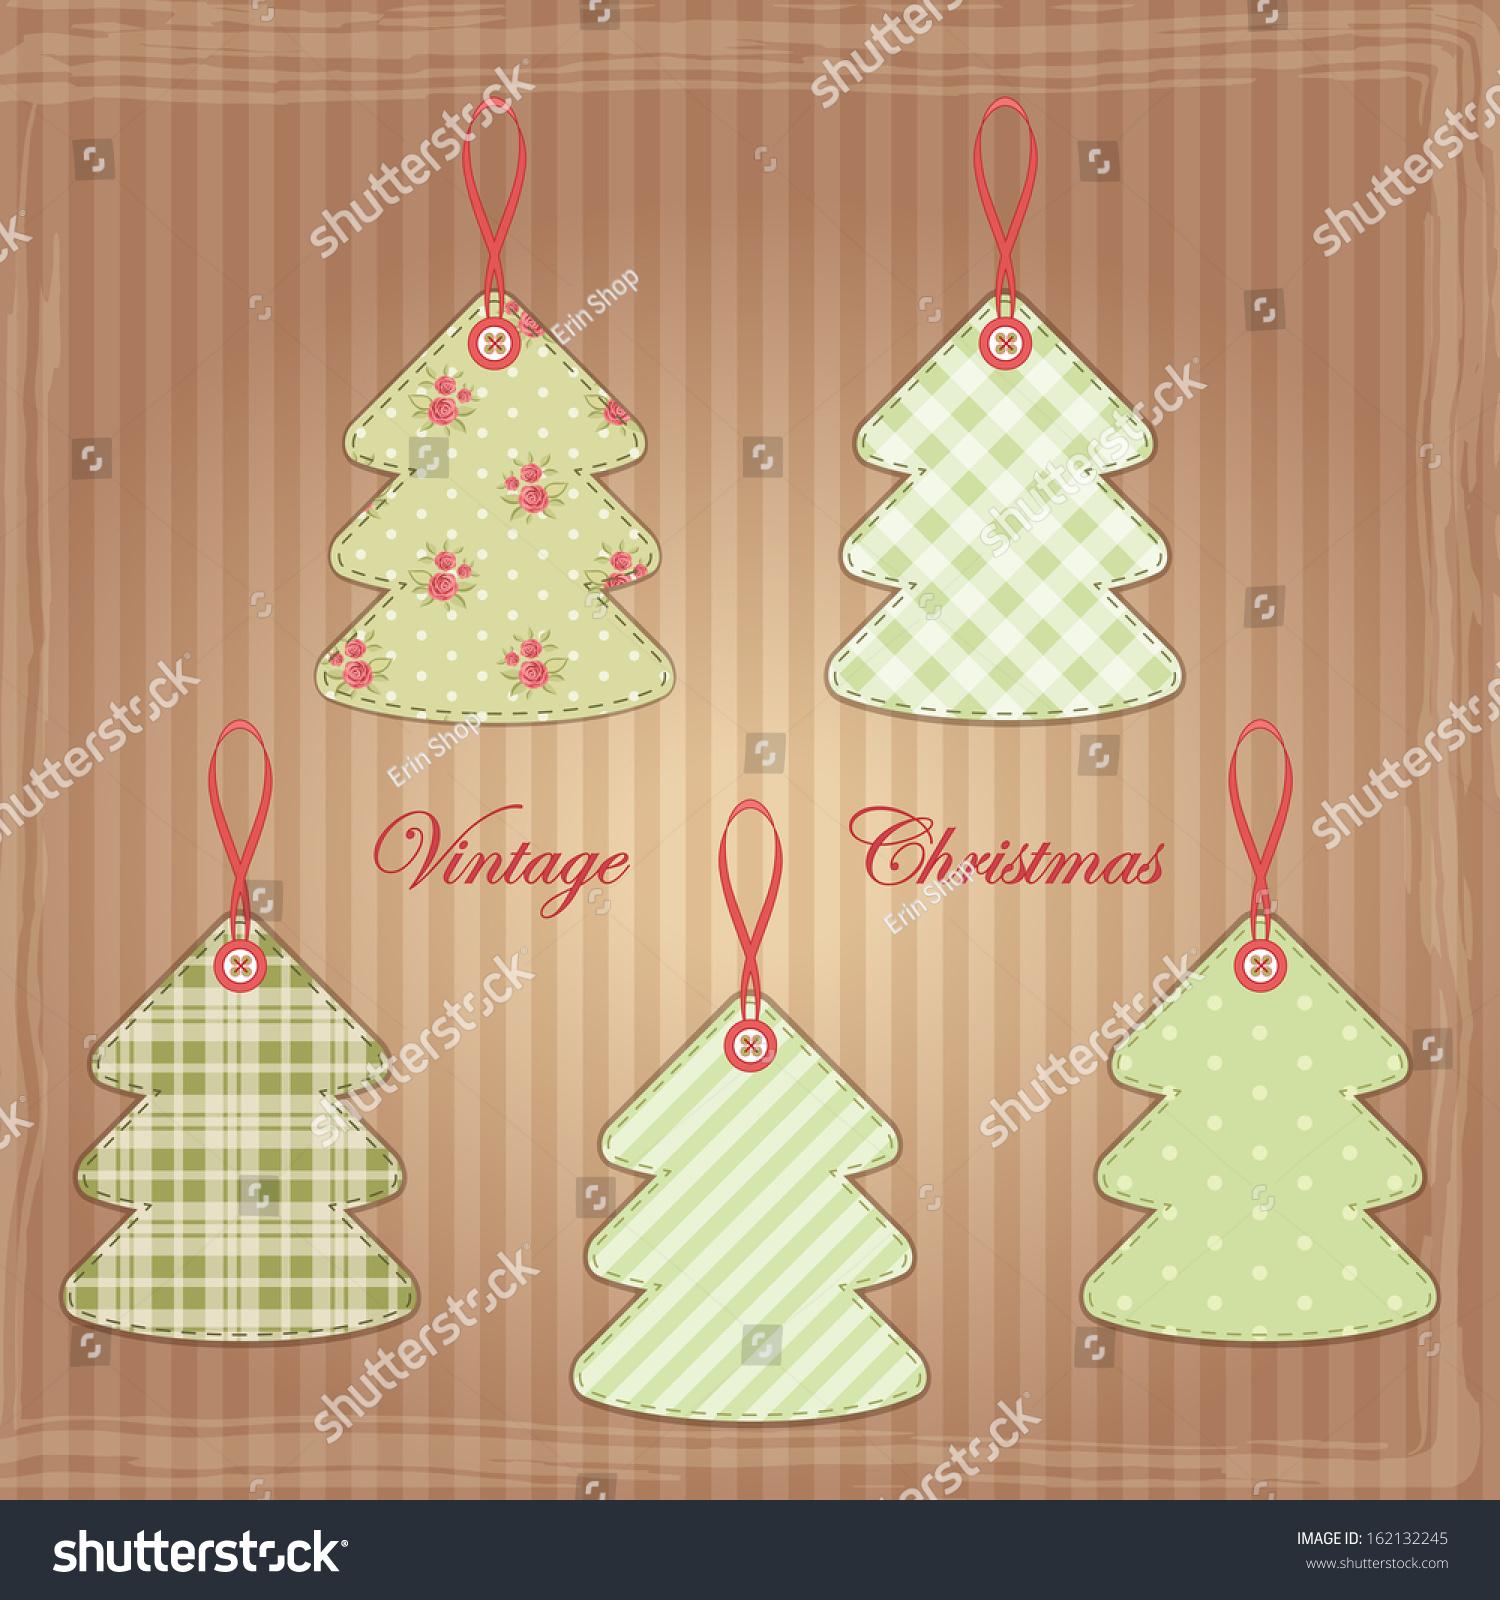 Vintage Christmas Trees Shabby Chic Style Stock Illustration 162132245